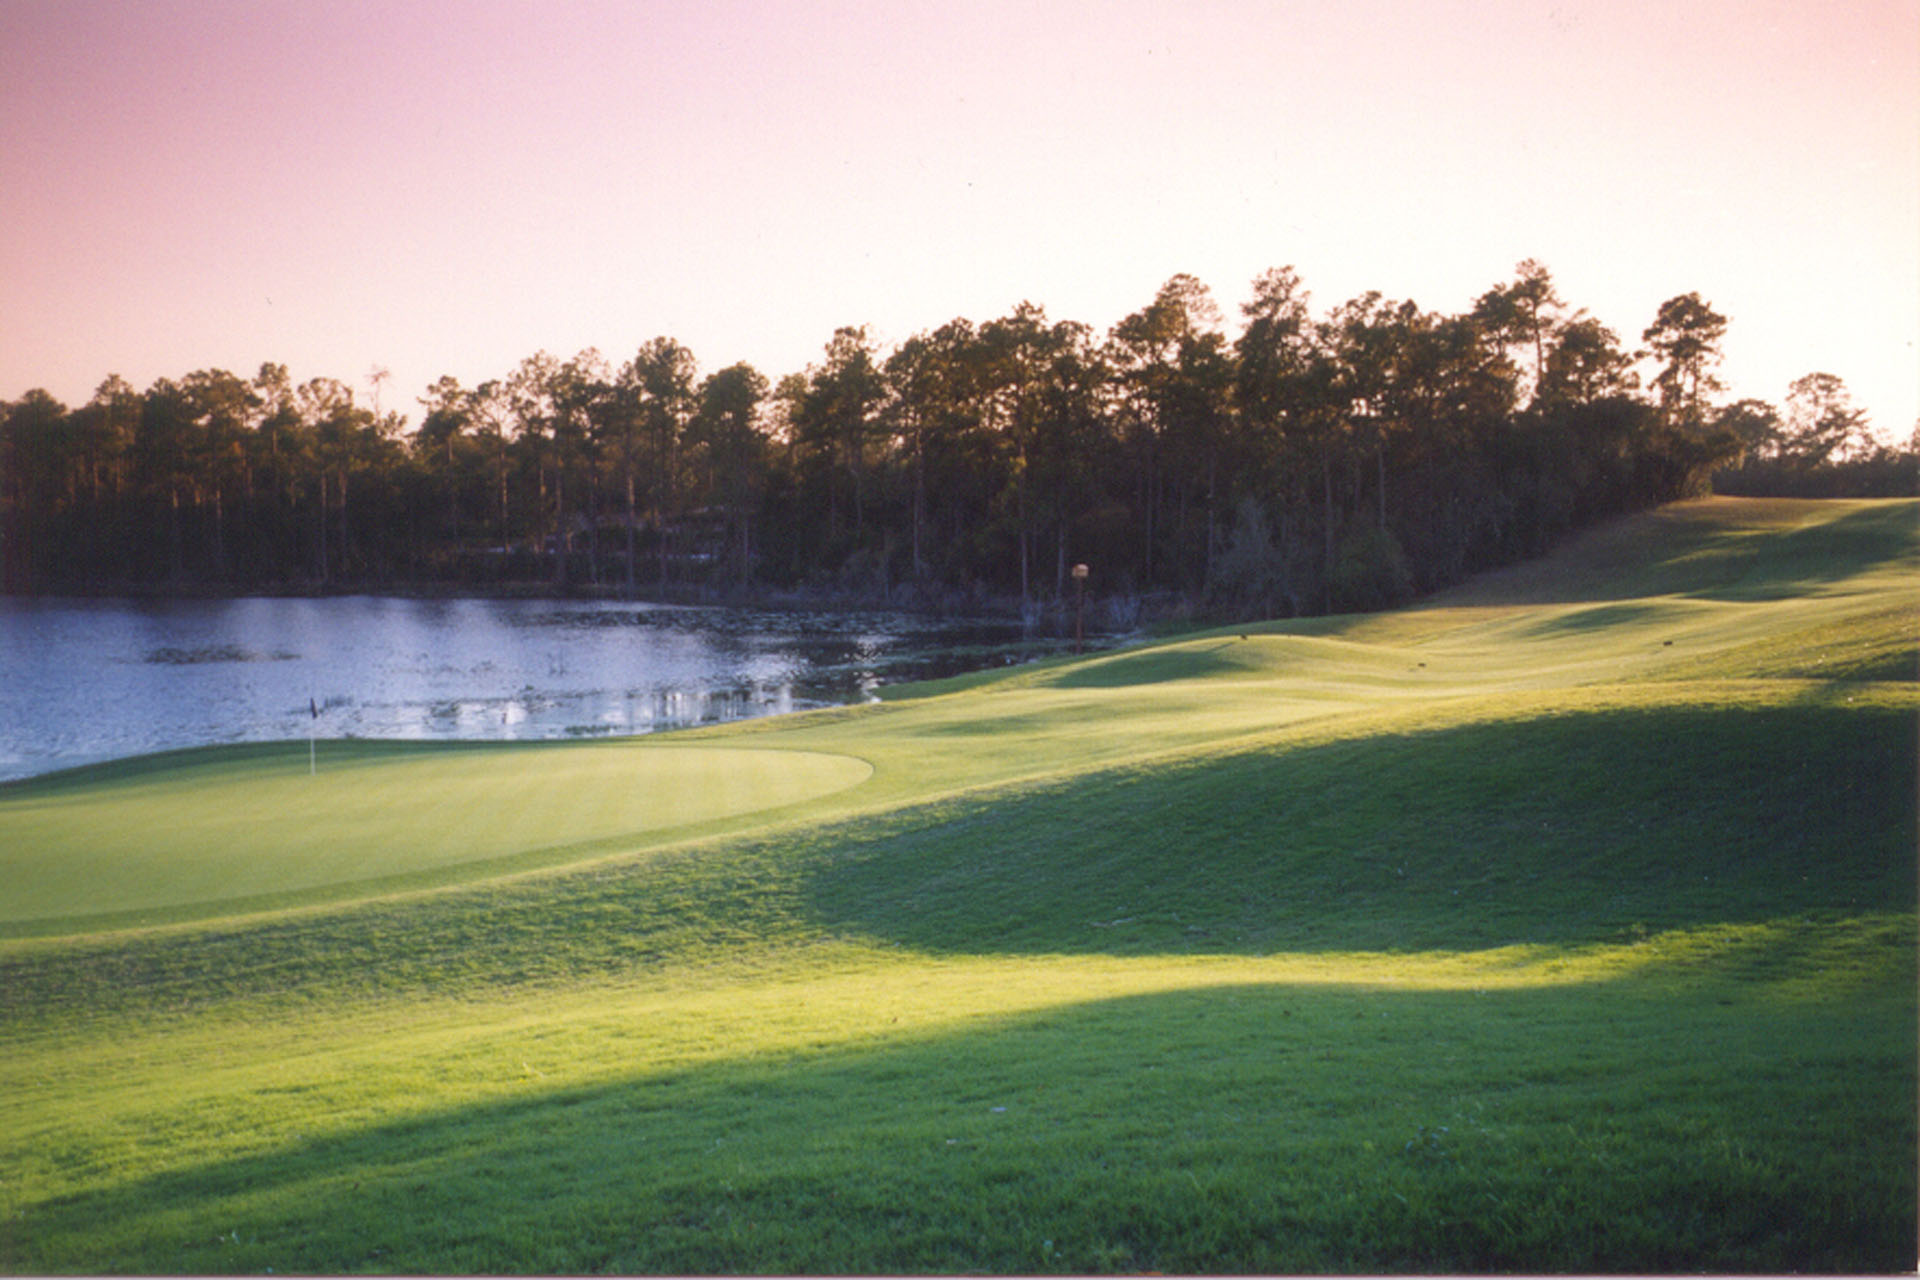 DeBary Golf & Country Club 19